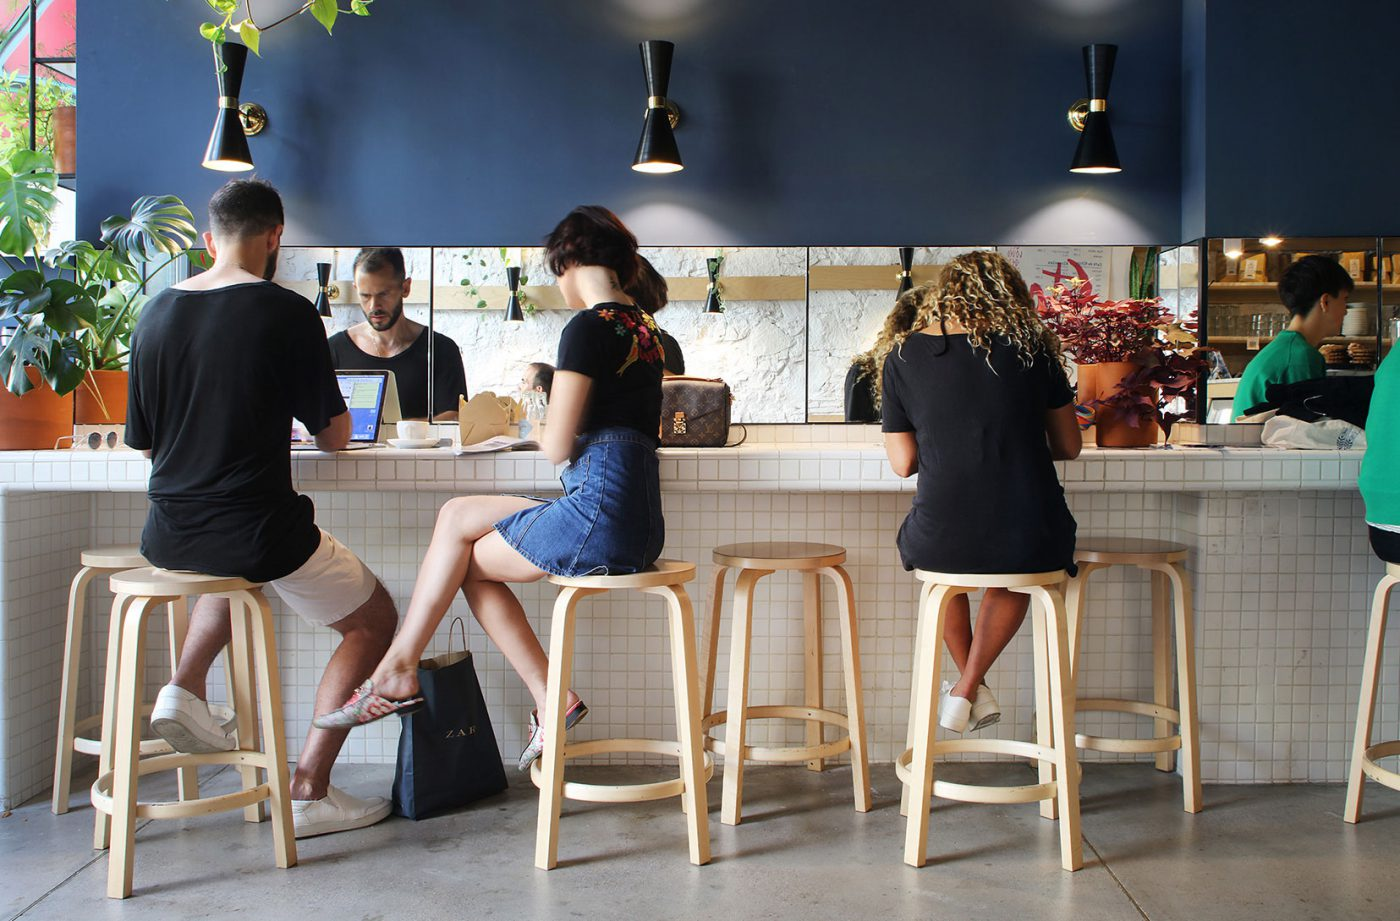 casa-bonay-barcelona-hotel-breakfast-satans-coffee-corner-03-1400x921.jpg